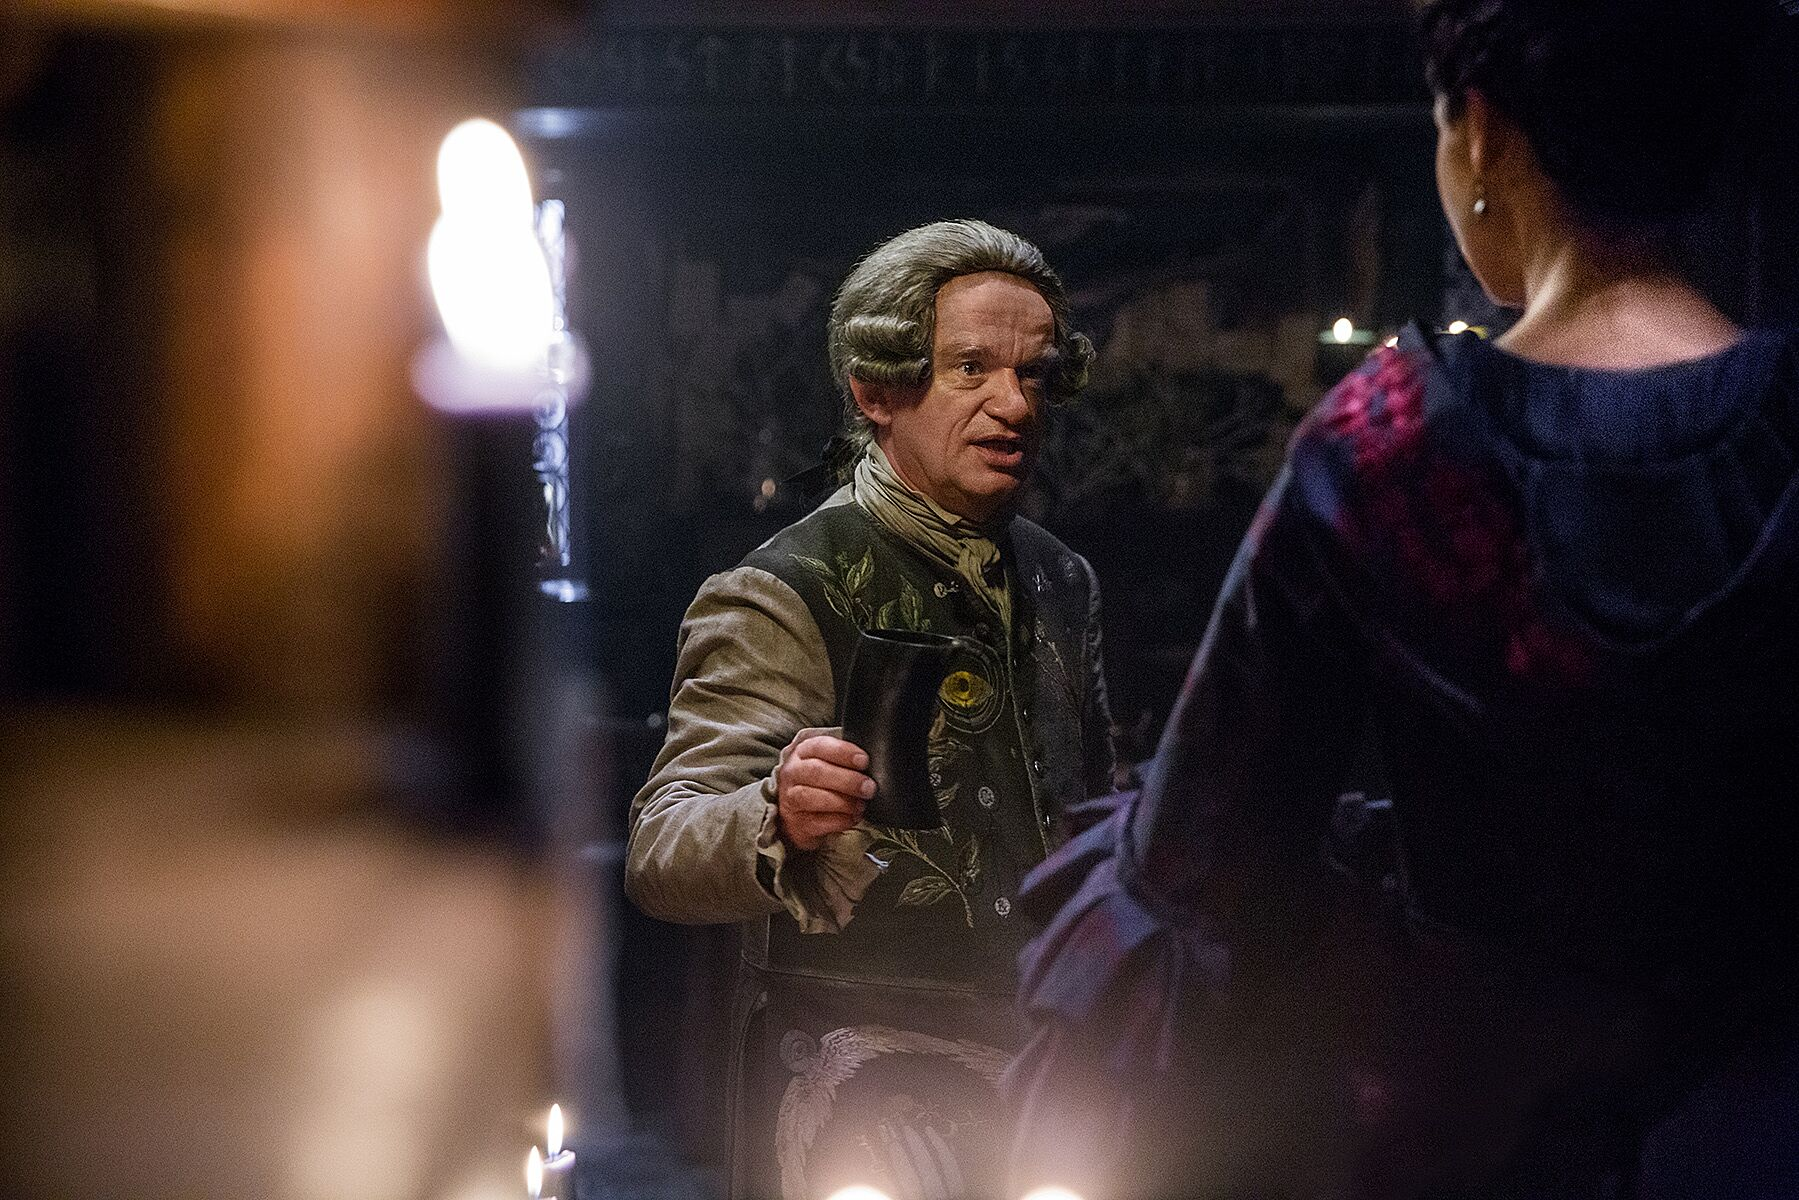 Outlander Season 2, Episode 3 recap: Claire finds solace in